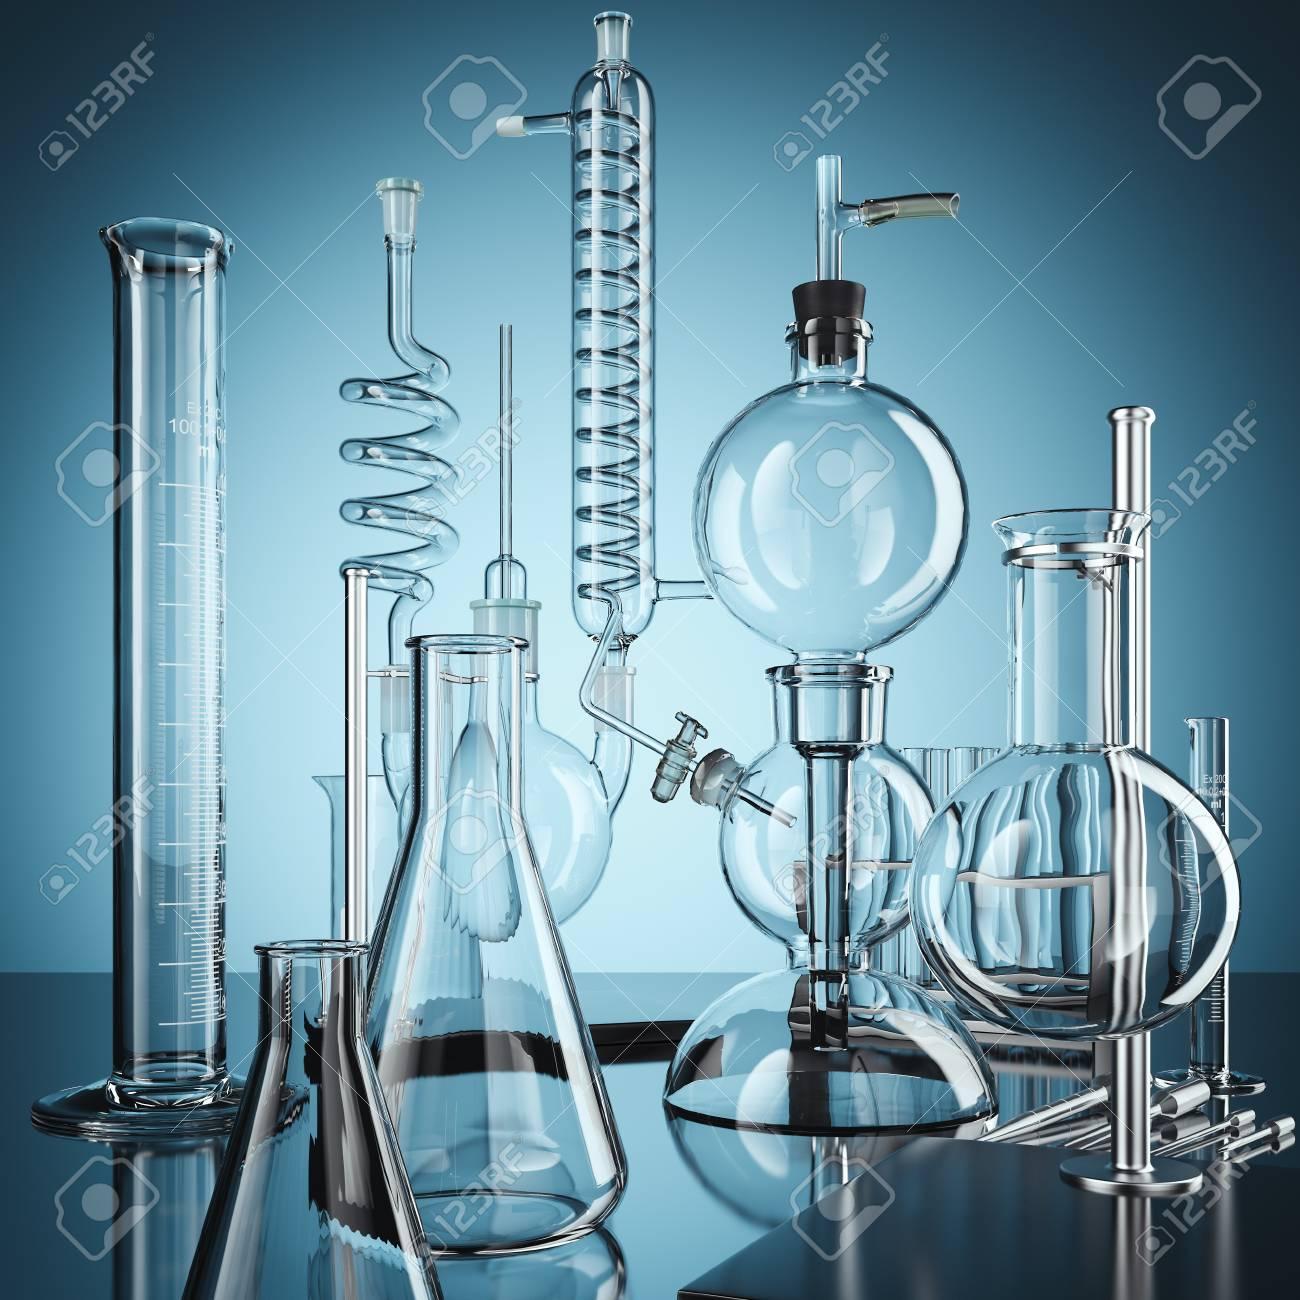 Glass chemistry lab equipment. 3d rendering - 90055994